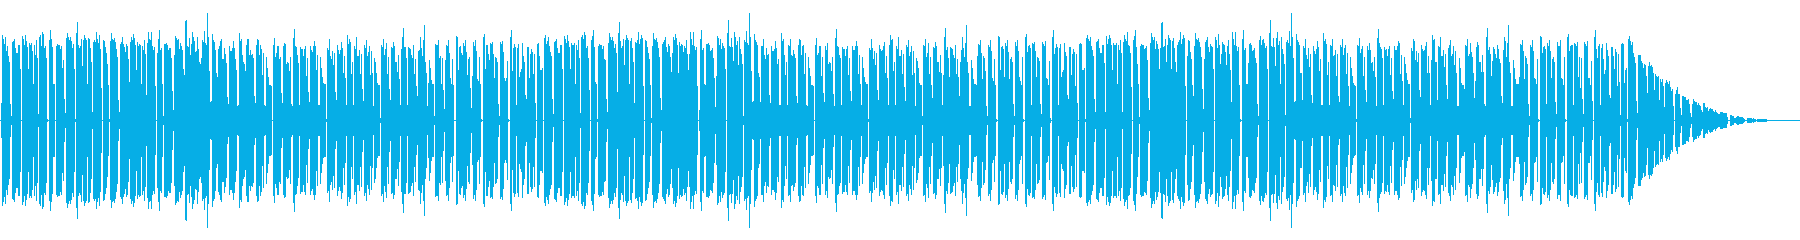 GB風スポーツゲームのステージ曲の再生済みの波形